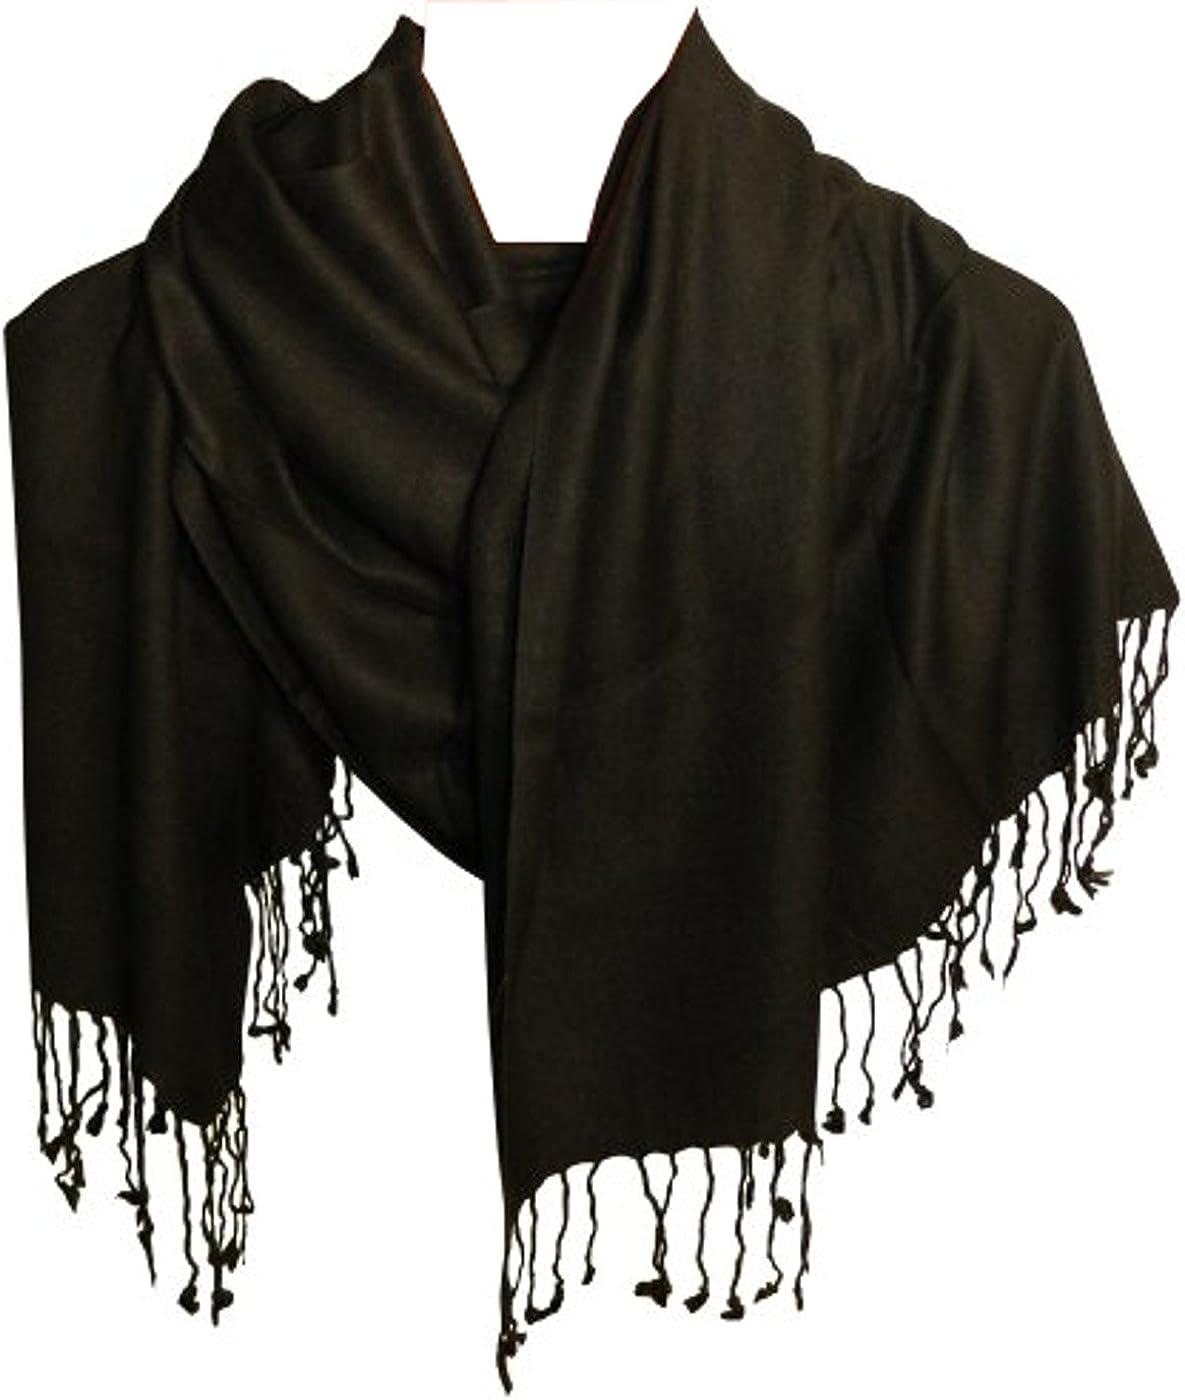 Pañuelo pasmina estilo negra viscosa algodón 190x52 cm fular ...